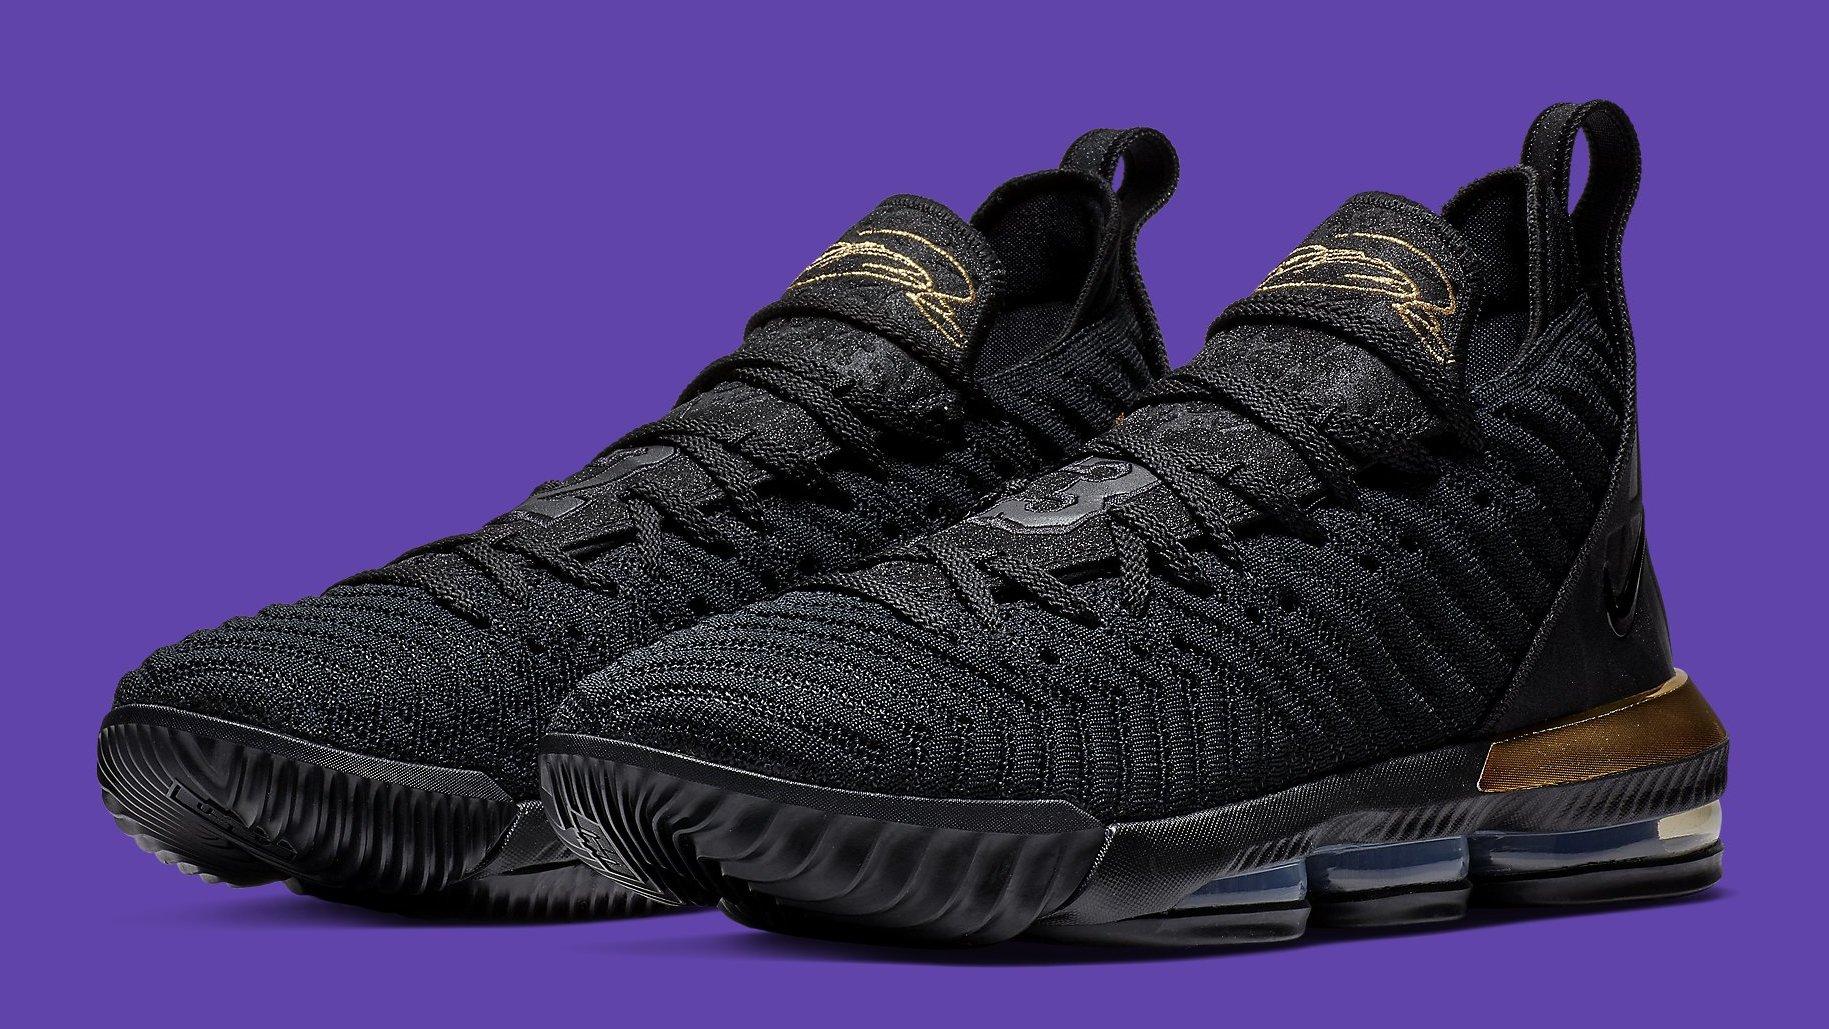 Nike LeBron 16 'I'm King' Black/Metallic Gold-Black BQ5970-007 ...